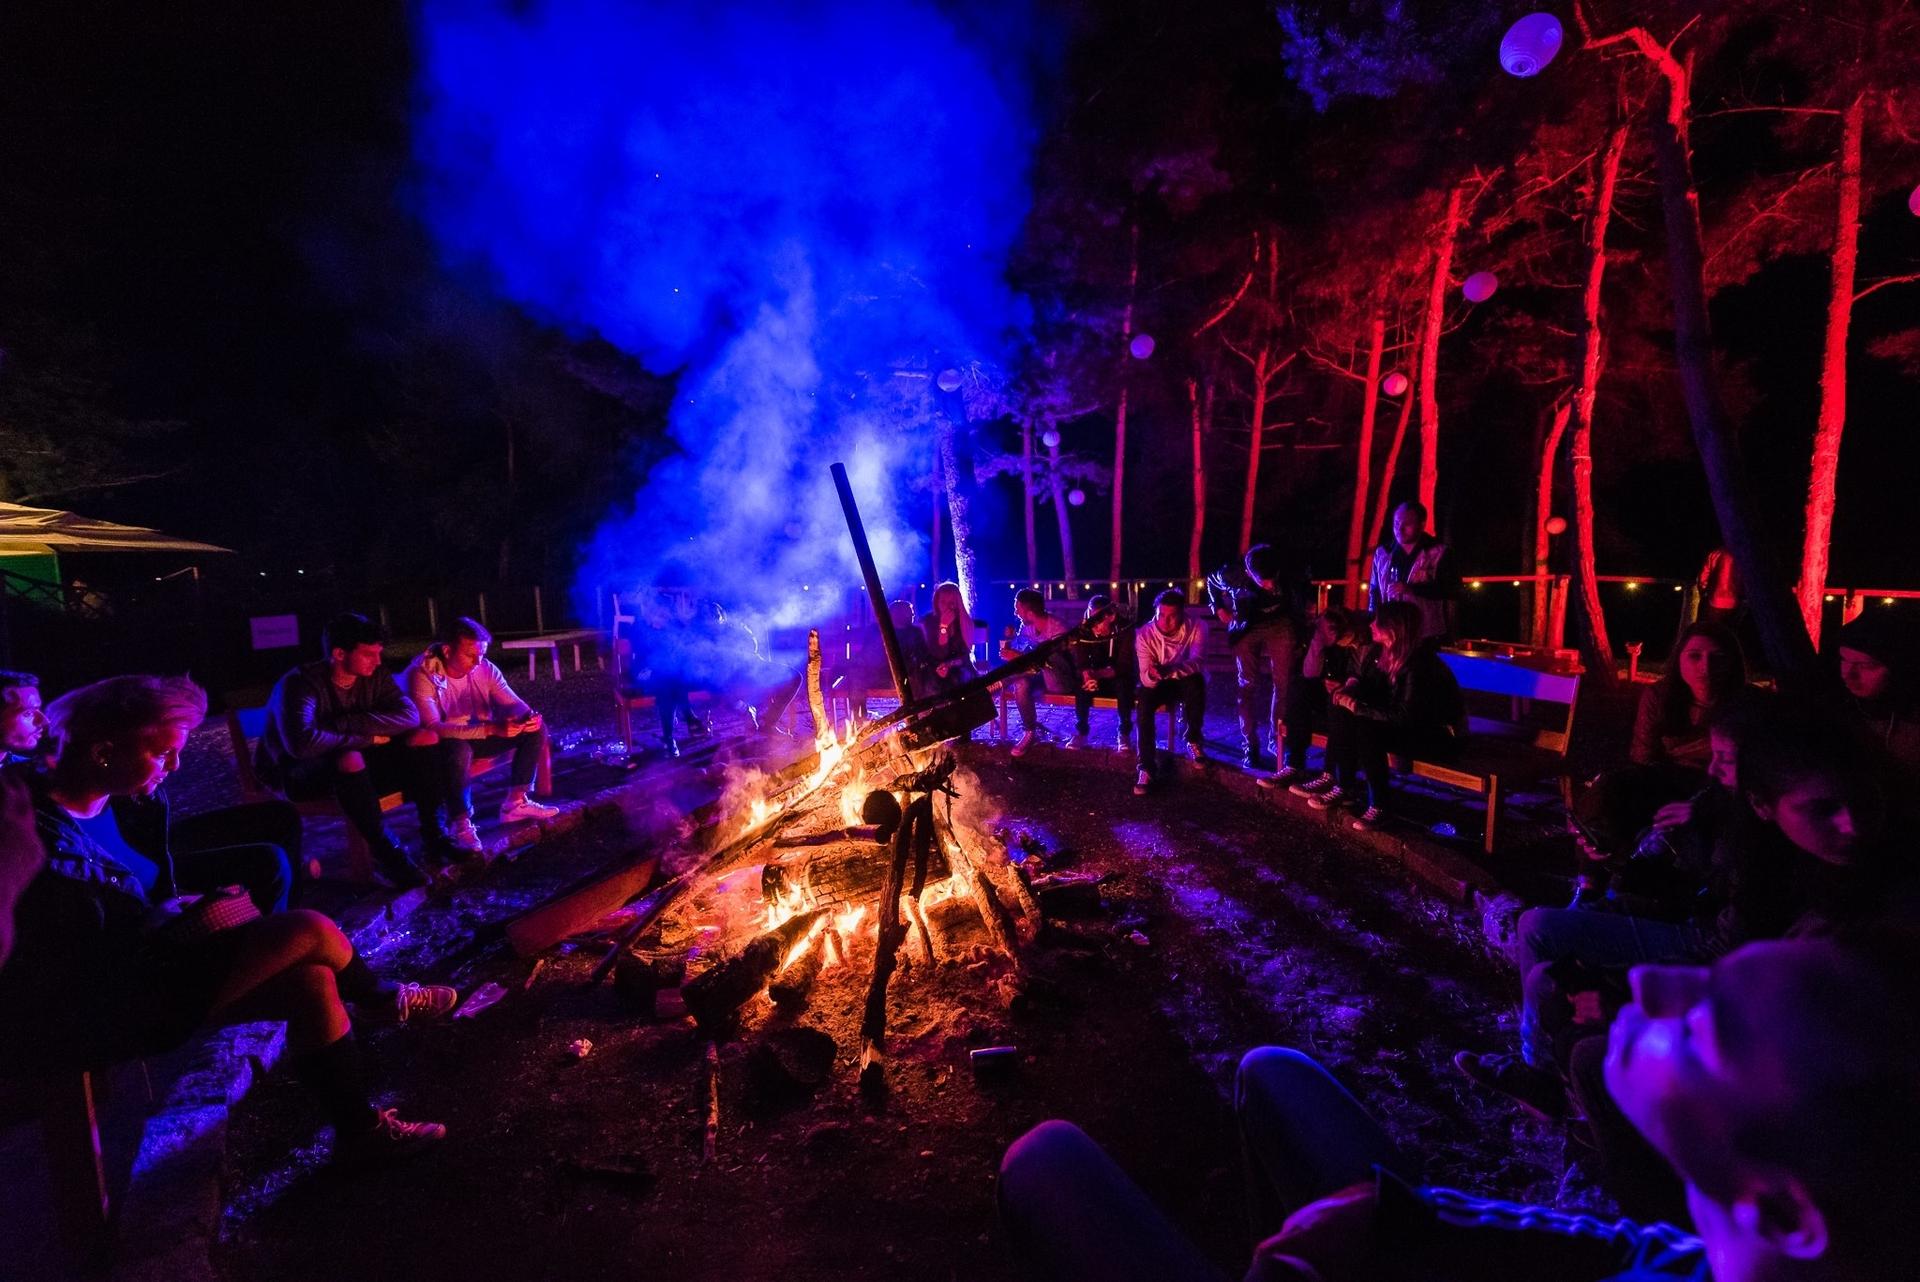 5 motive care te vor convinge să mergi la Alandala by the lake ▼